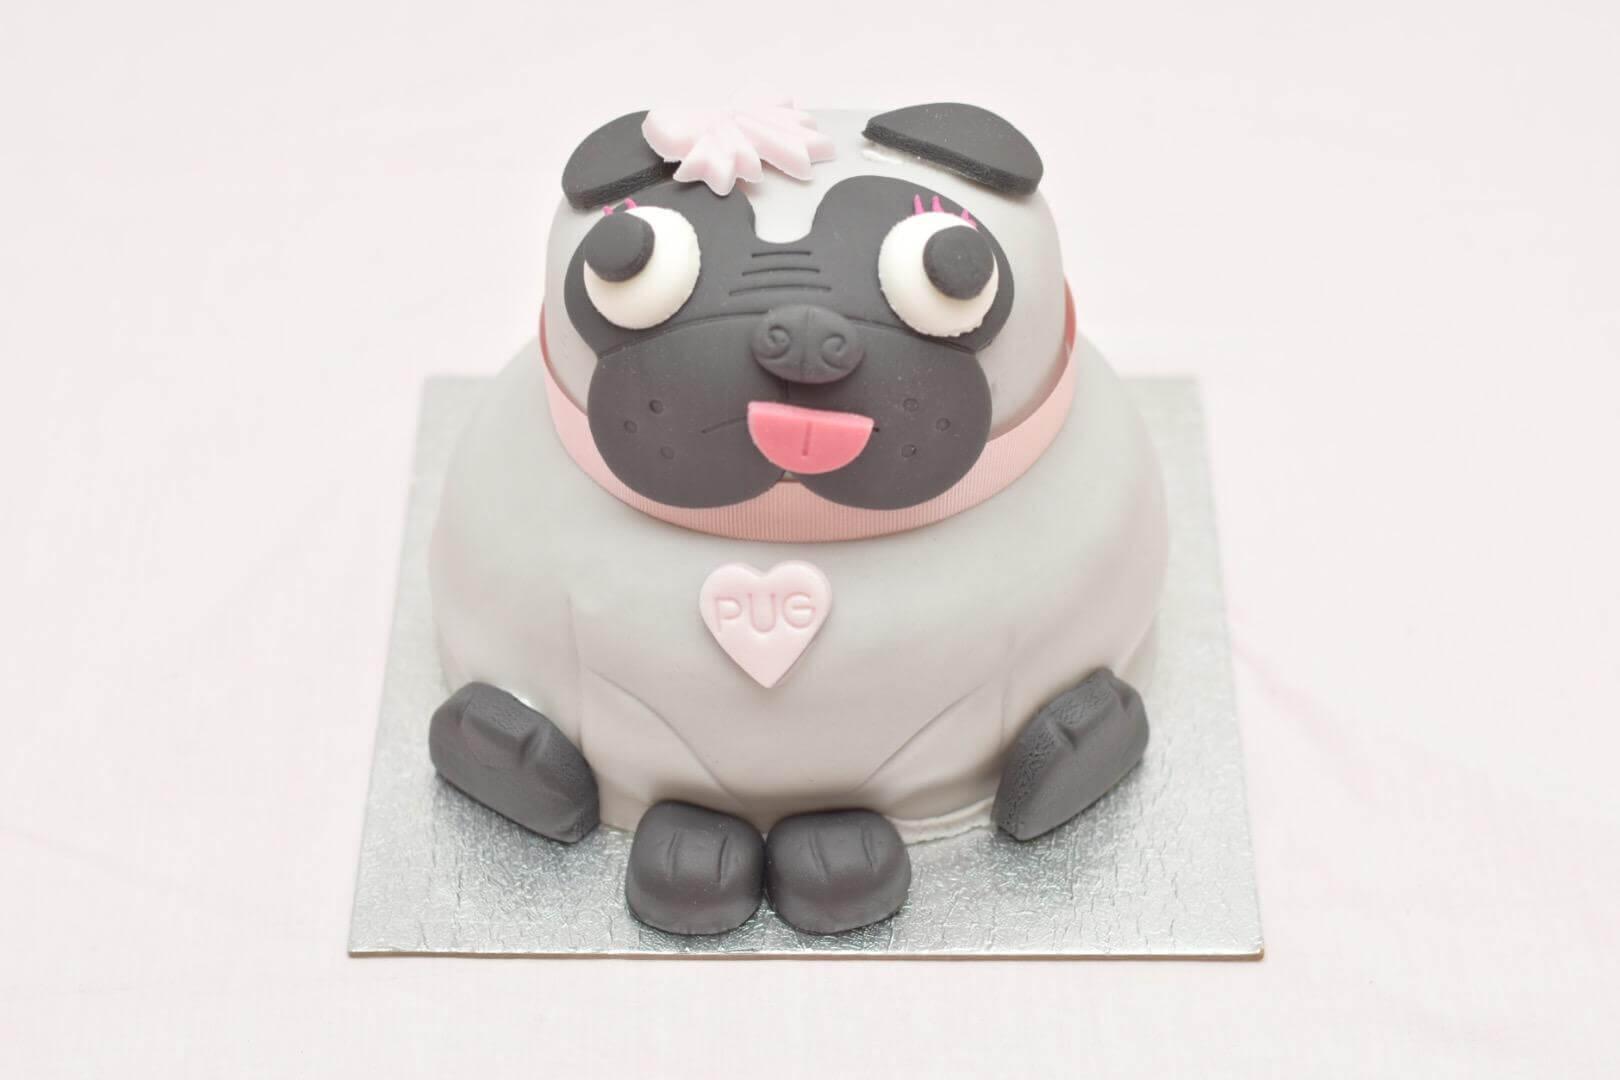 Birthday Cakes Asda Childrens ~ A pug birthday cake from asda · the inspiration edit